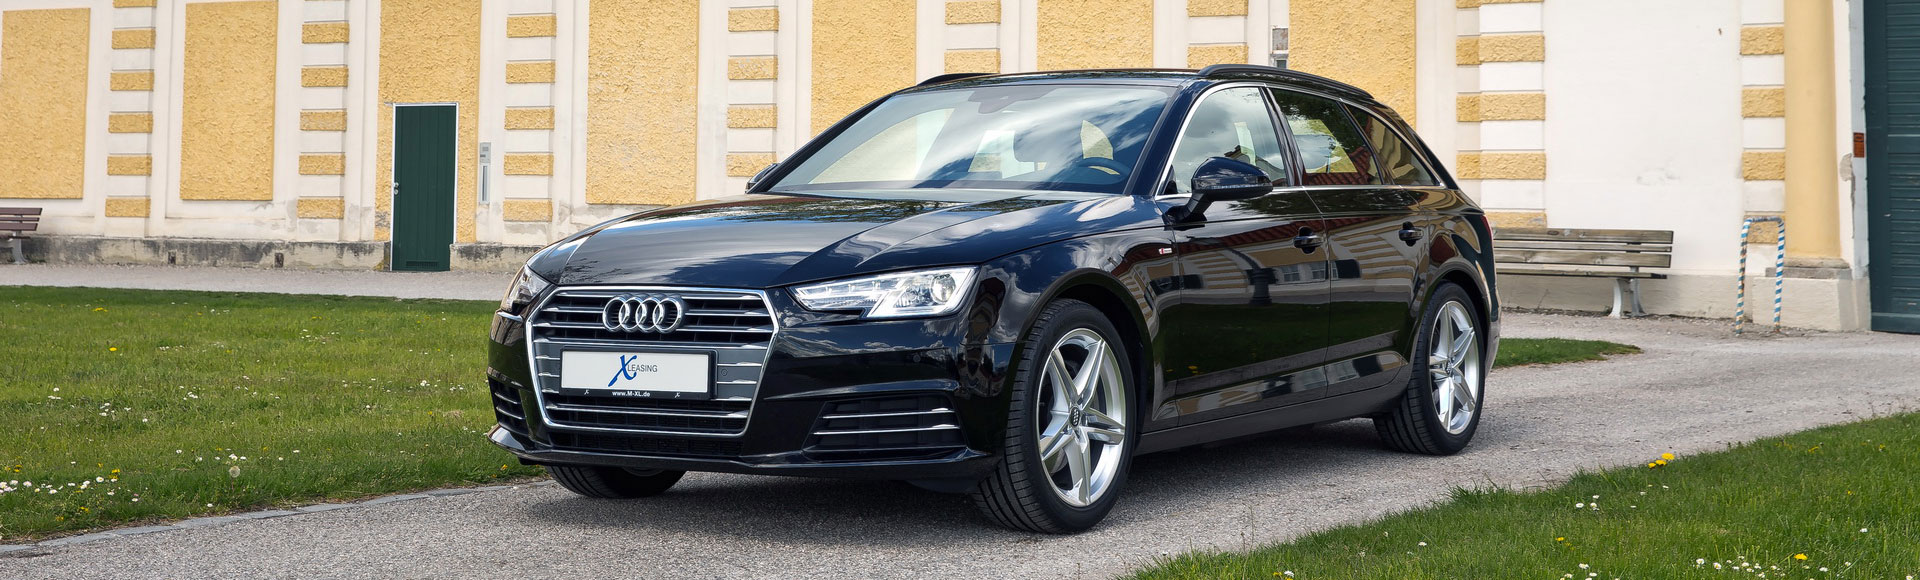 Audi A4 Avant 2016 Spring 294